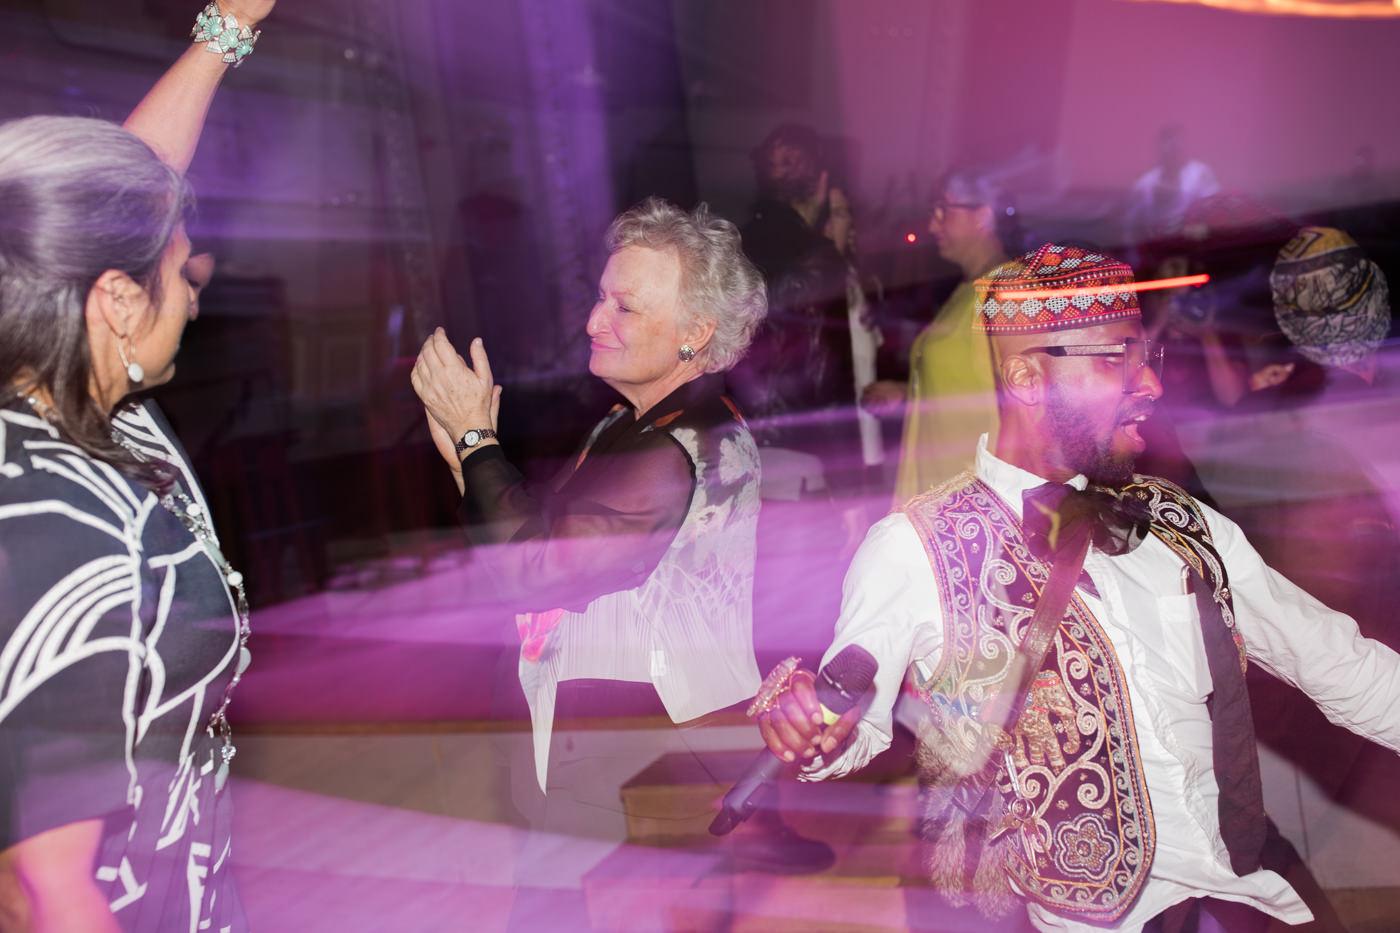 Mt Tremper Arts Gala -  NYC event photographer Kamp Weddings-33.jpg